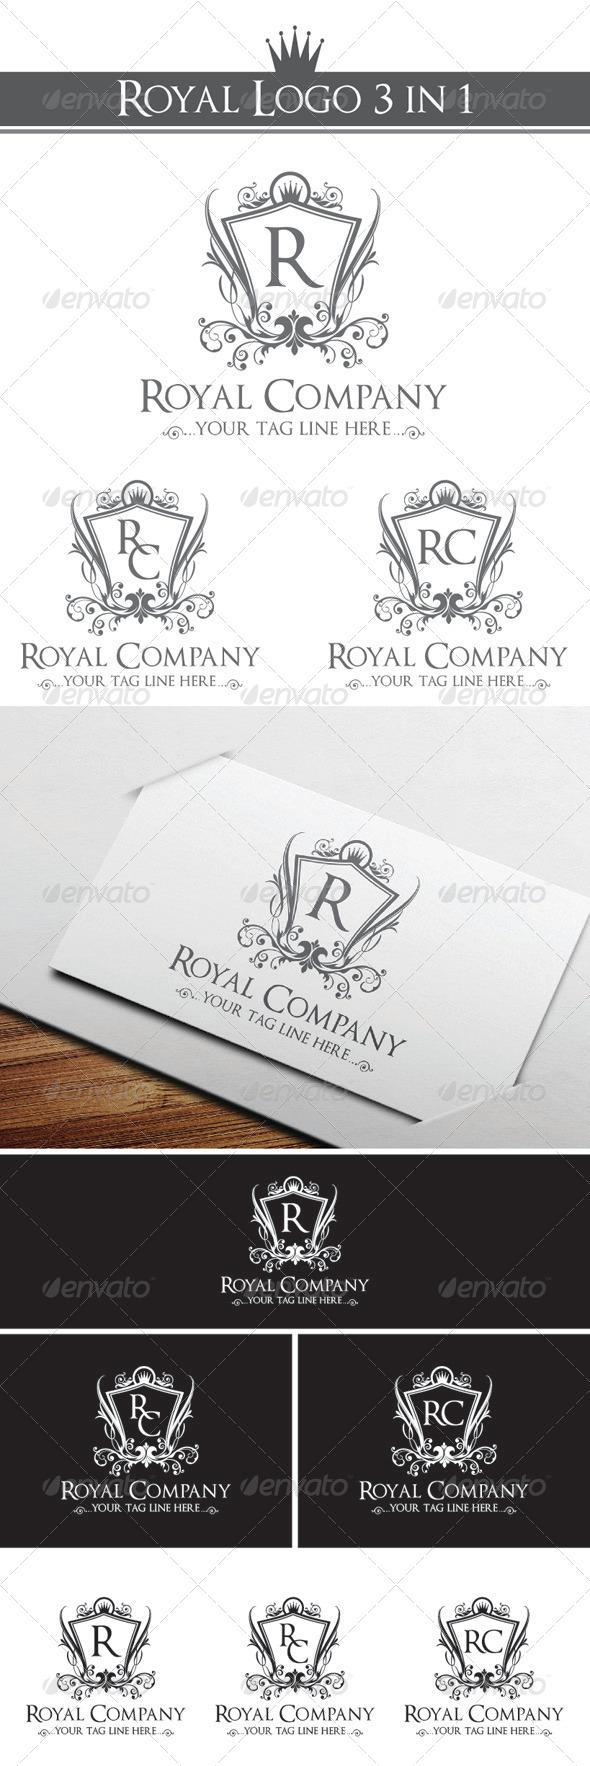 GraphicRiver Royal Company Logo Template 4246239